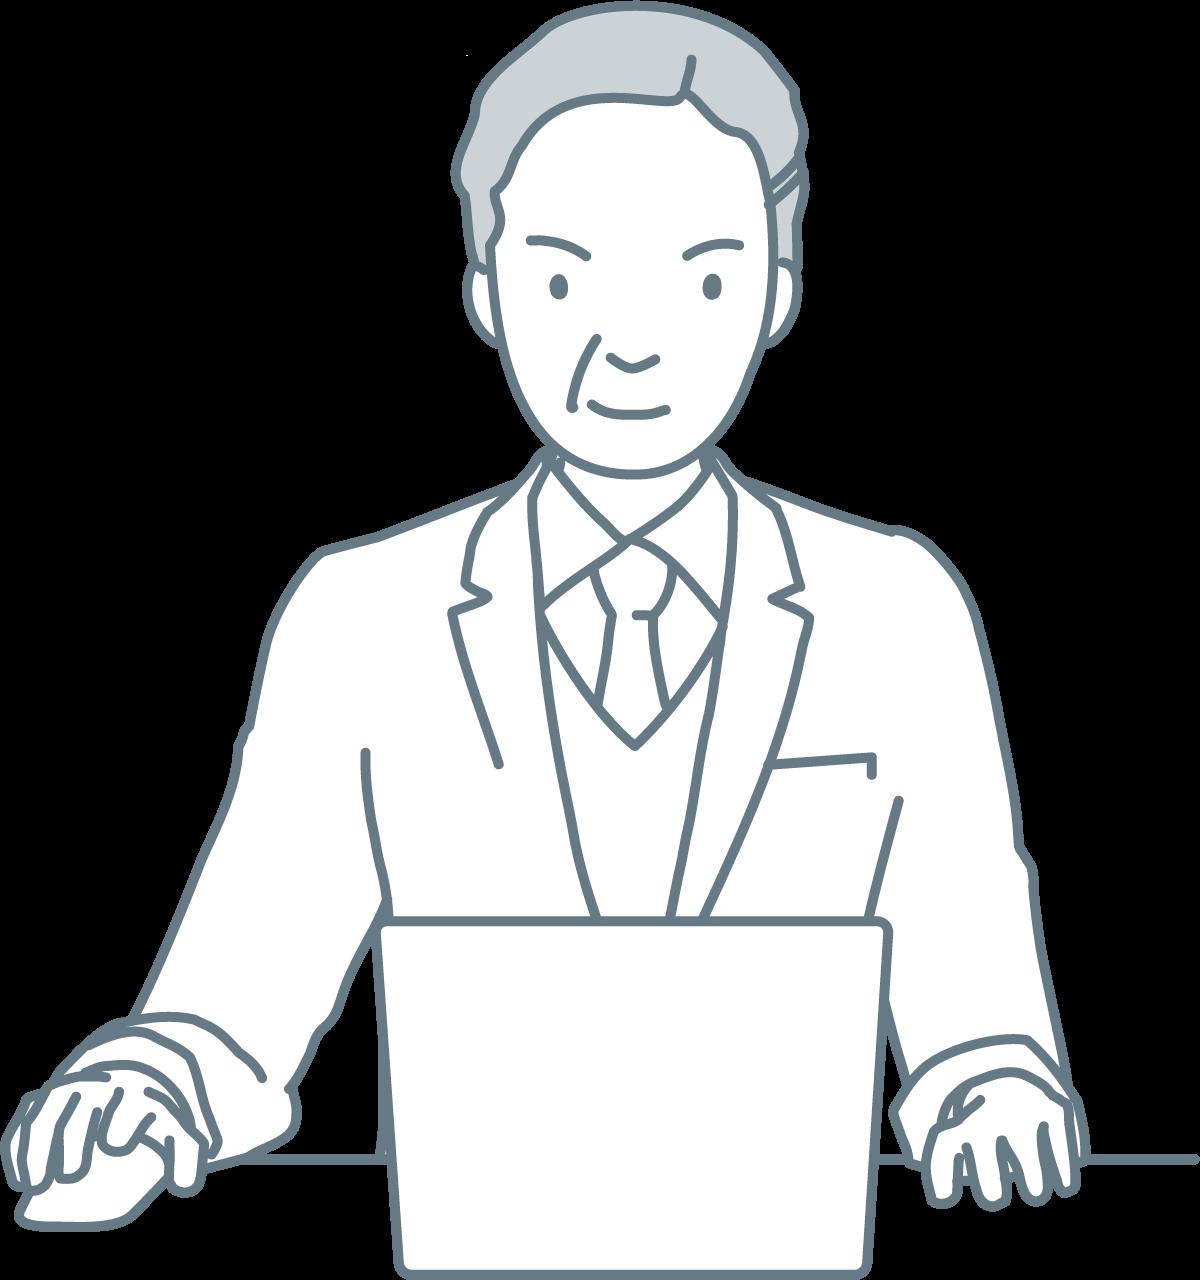 contrfinder-illustration__people-president